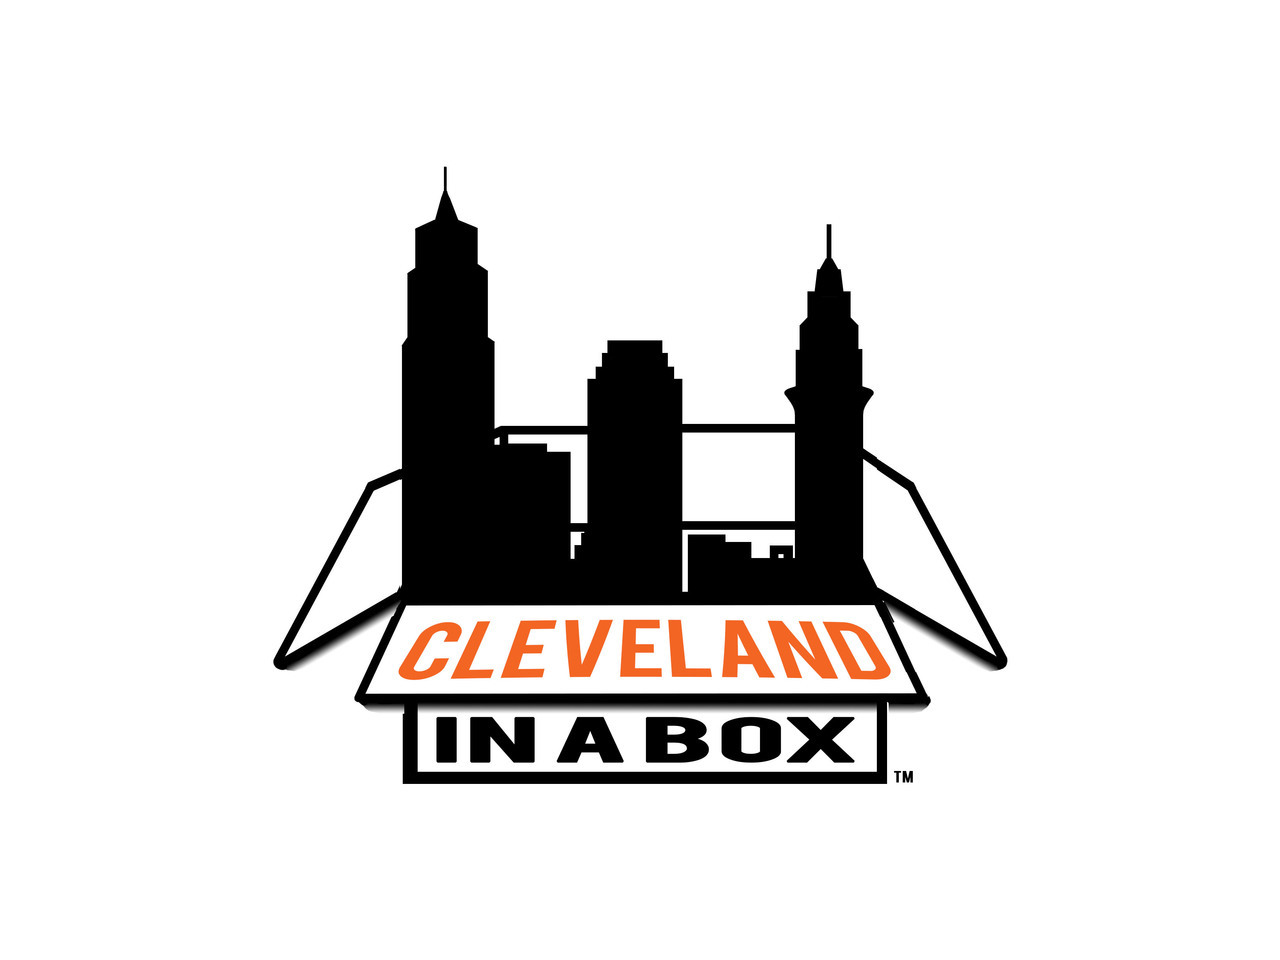 Cleveland In A Box